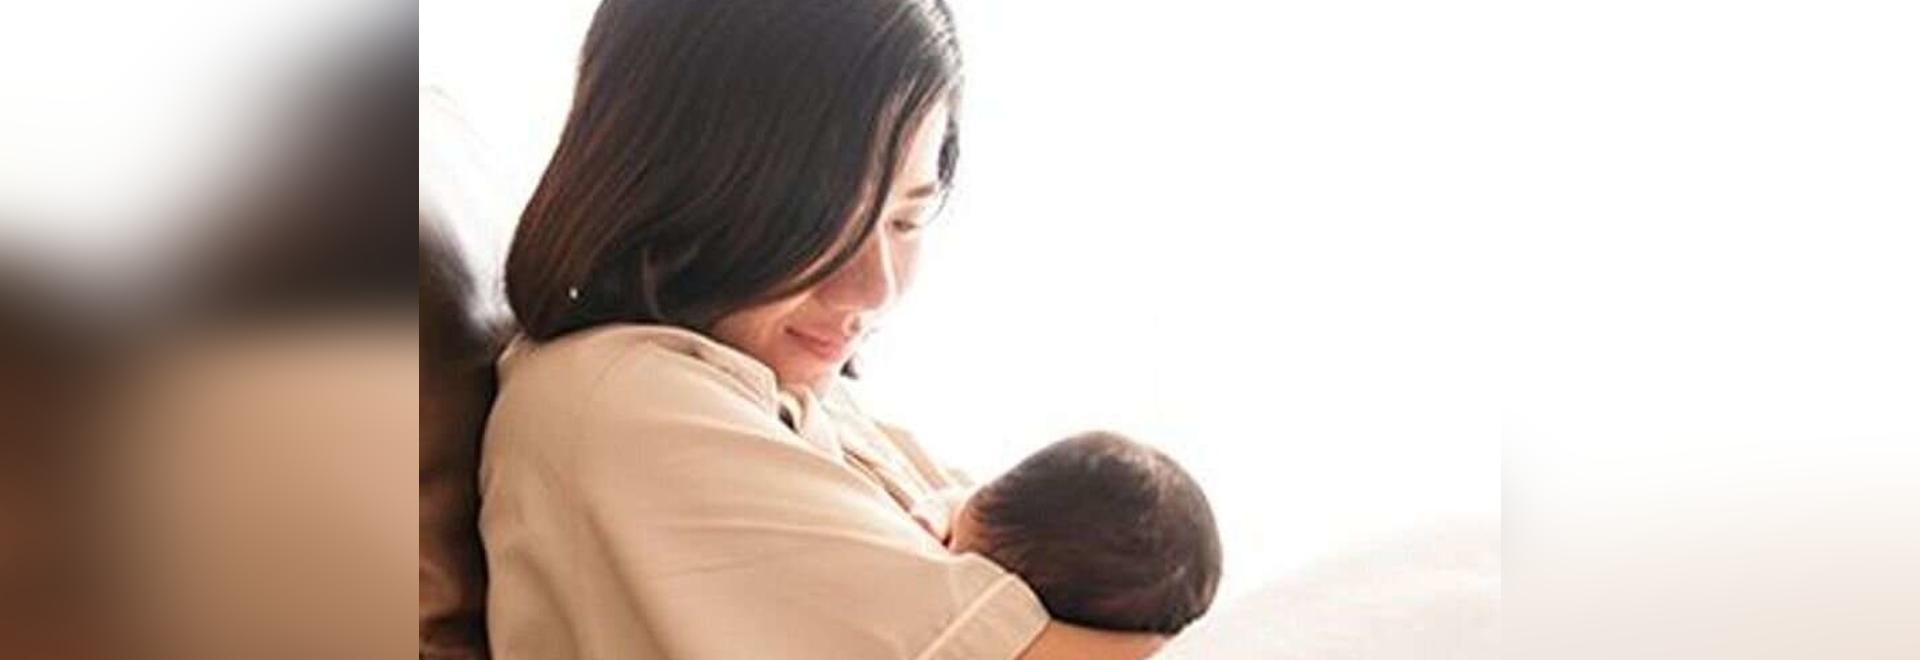 Newborns won't get COVID through infected mom's breast milk: study